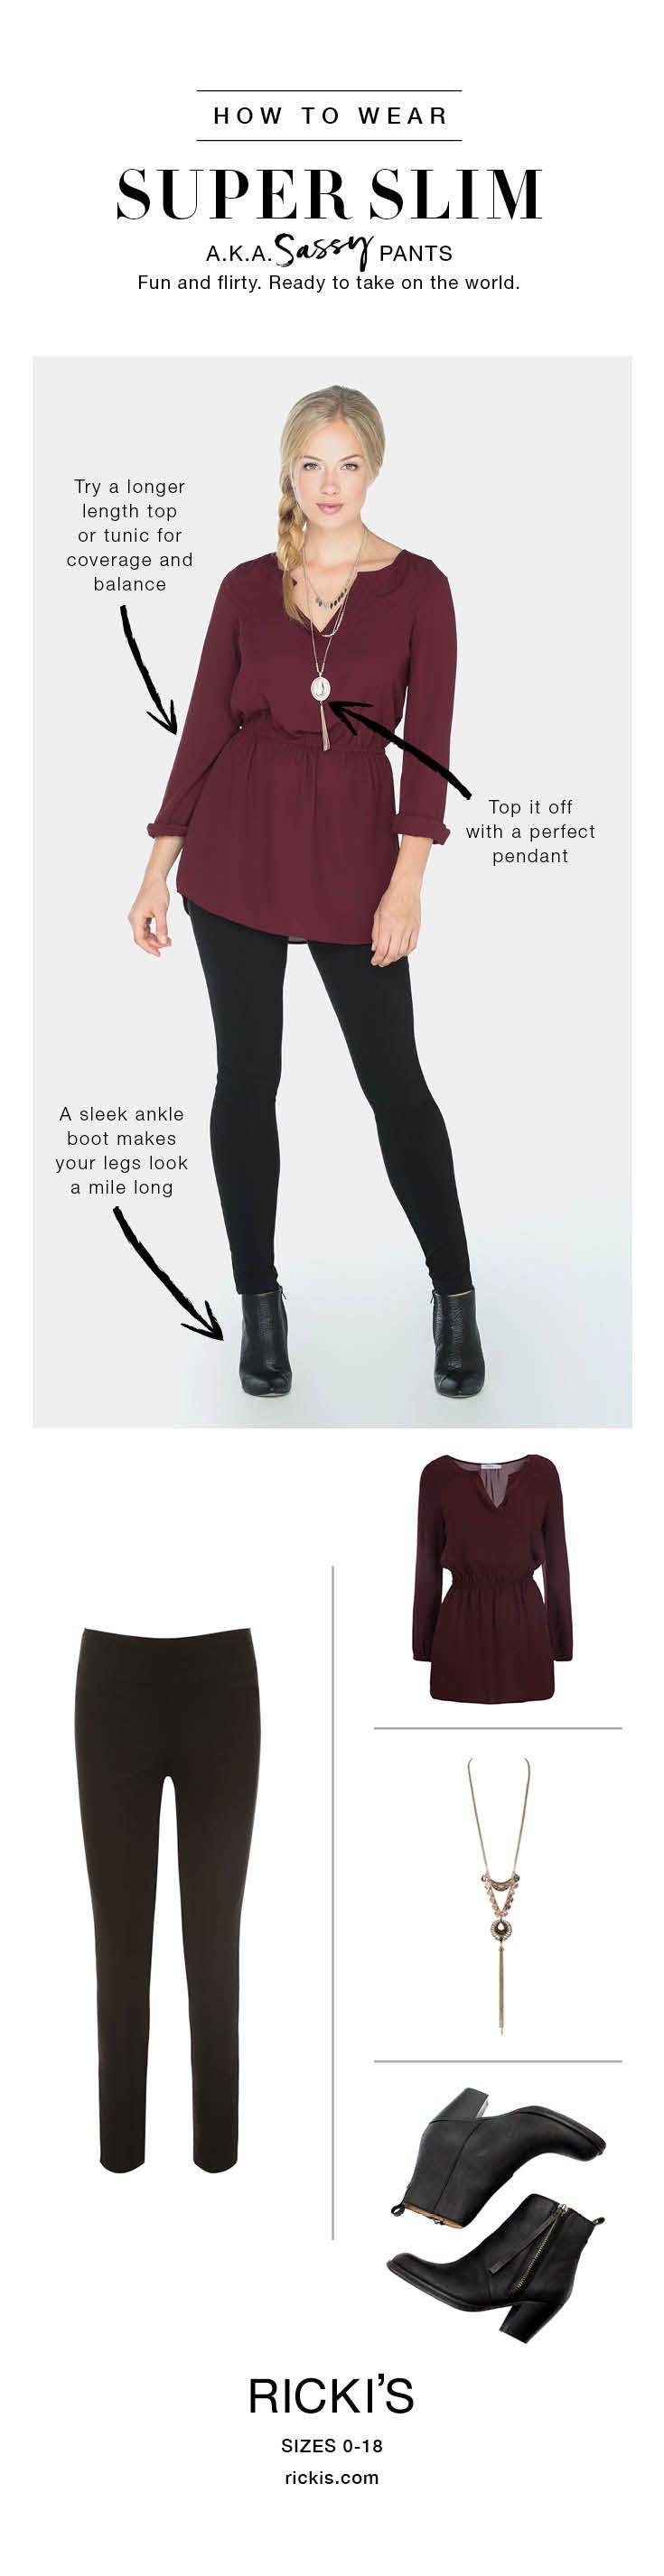 Ricki's Slim Microtwill Pant - Size 2, Black, Short, 29 inseam